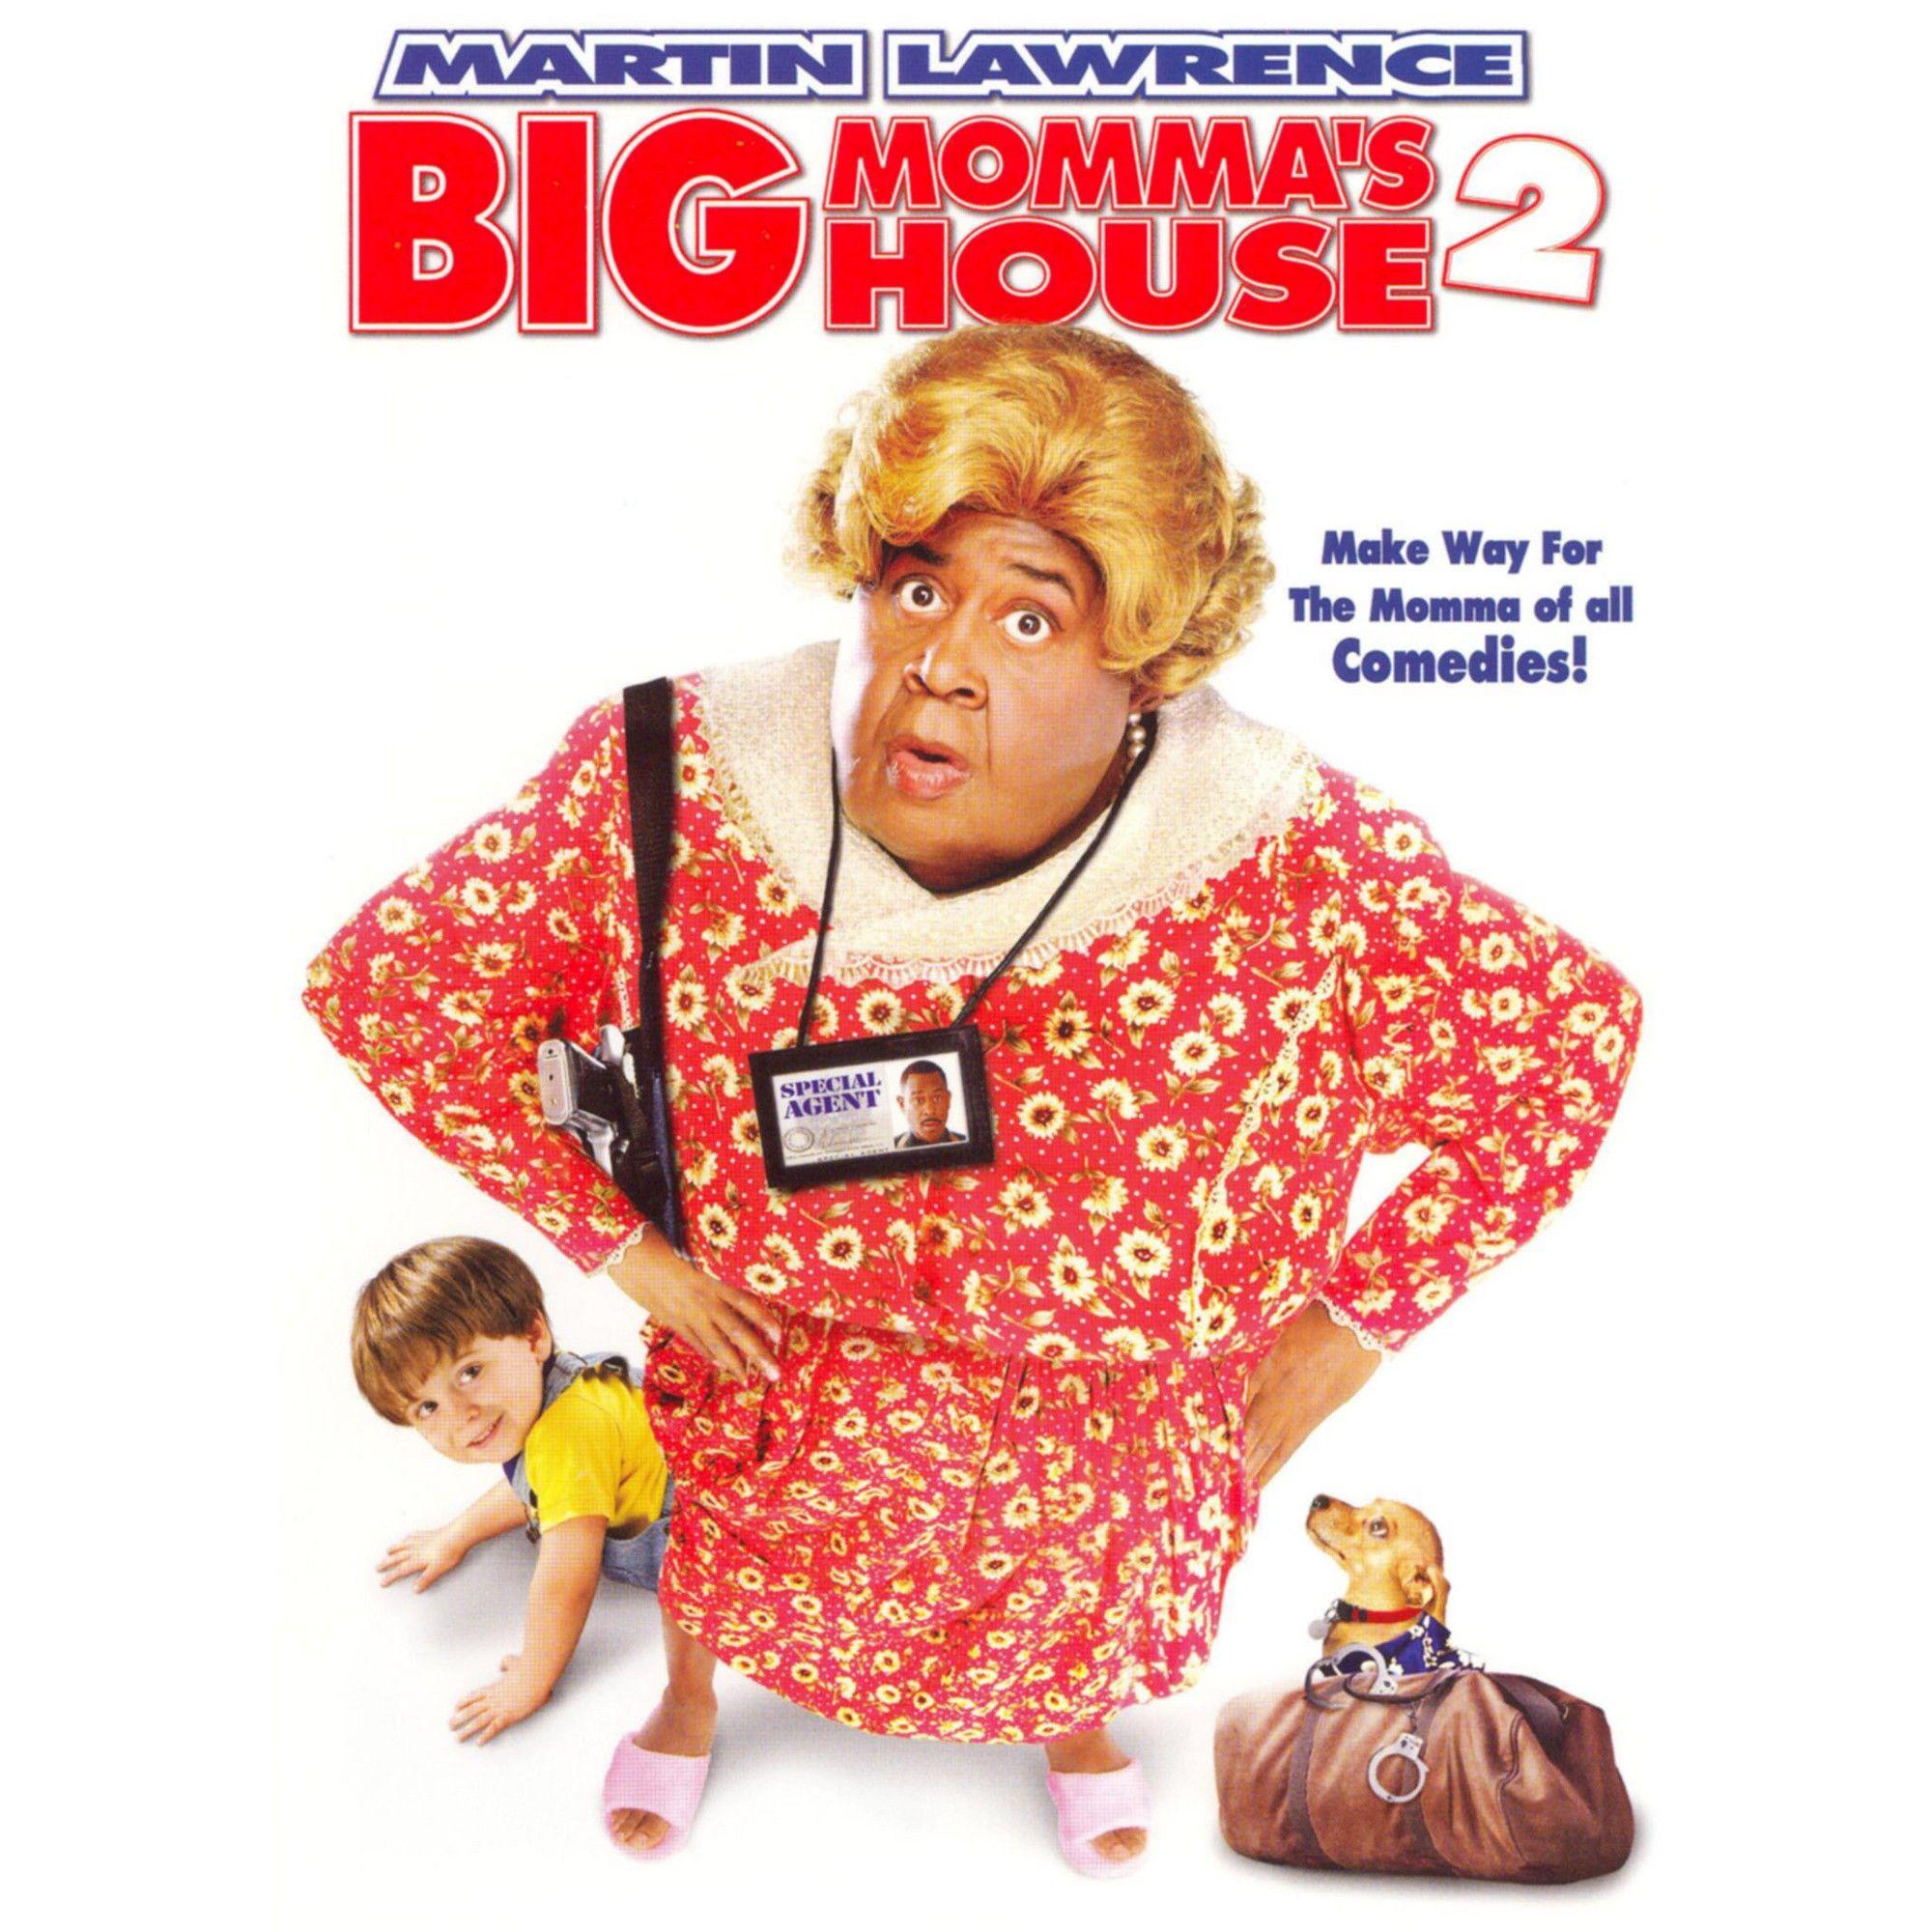 Big mommas house 2 dvd_video big mommas house